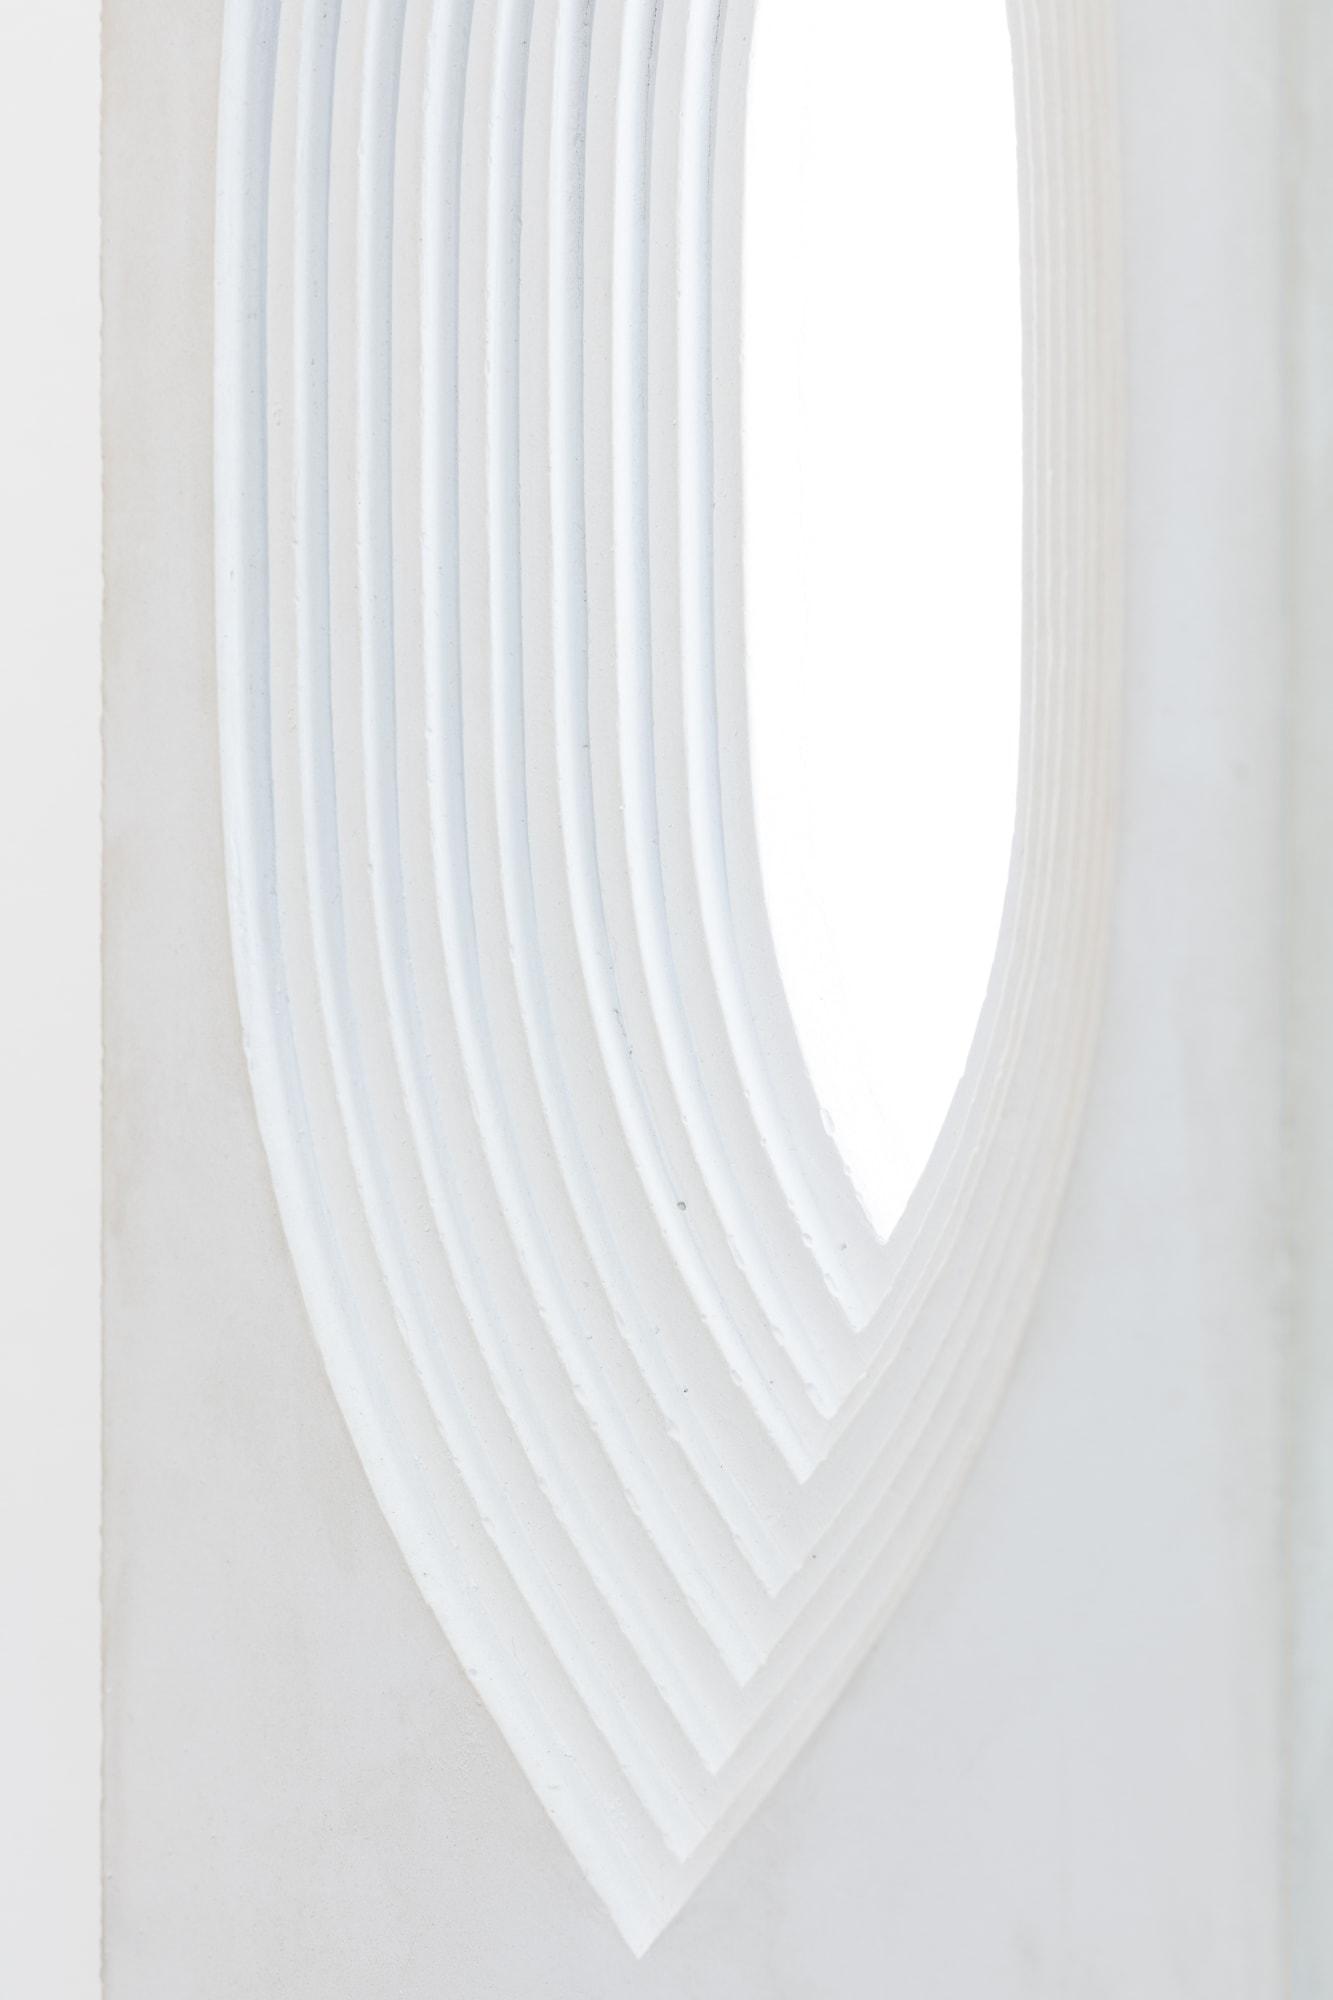 Kai Trausenegger Straight Edge Smolka Contemporary